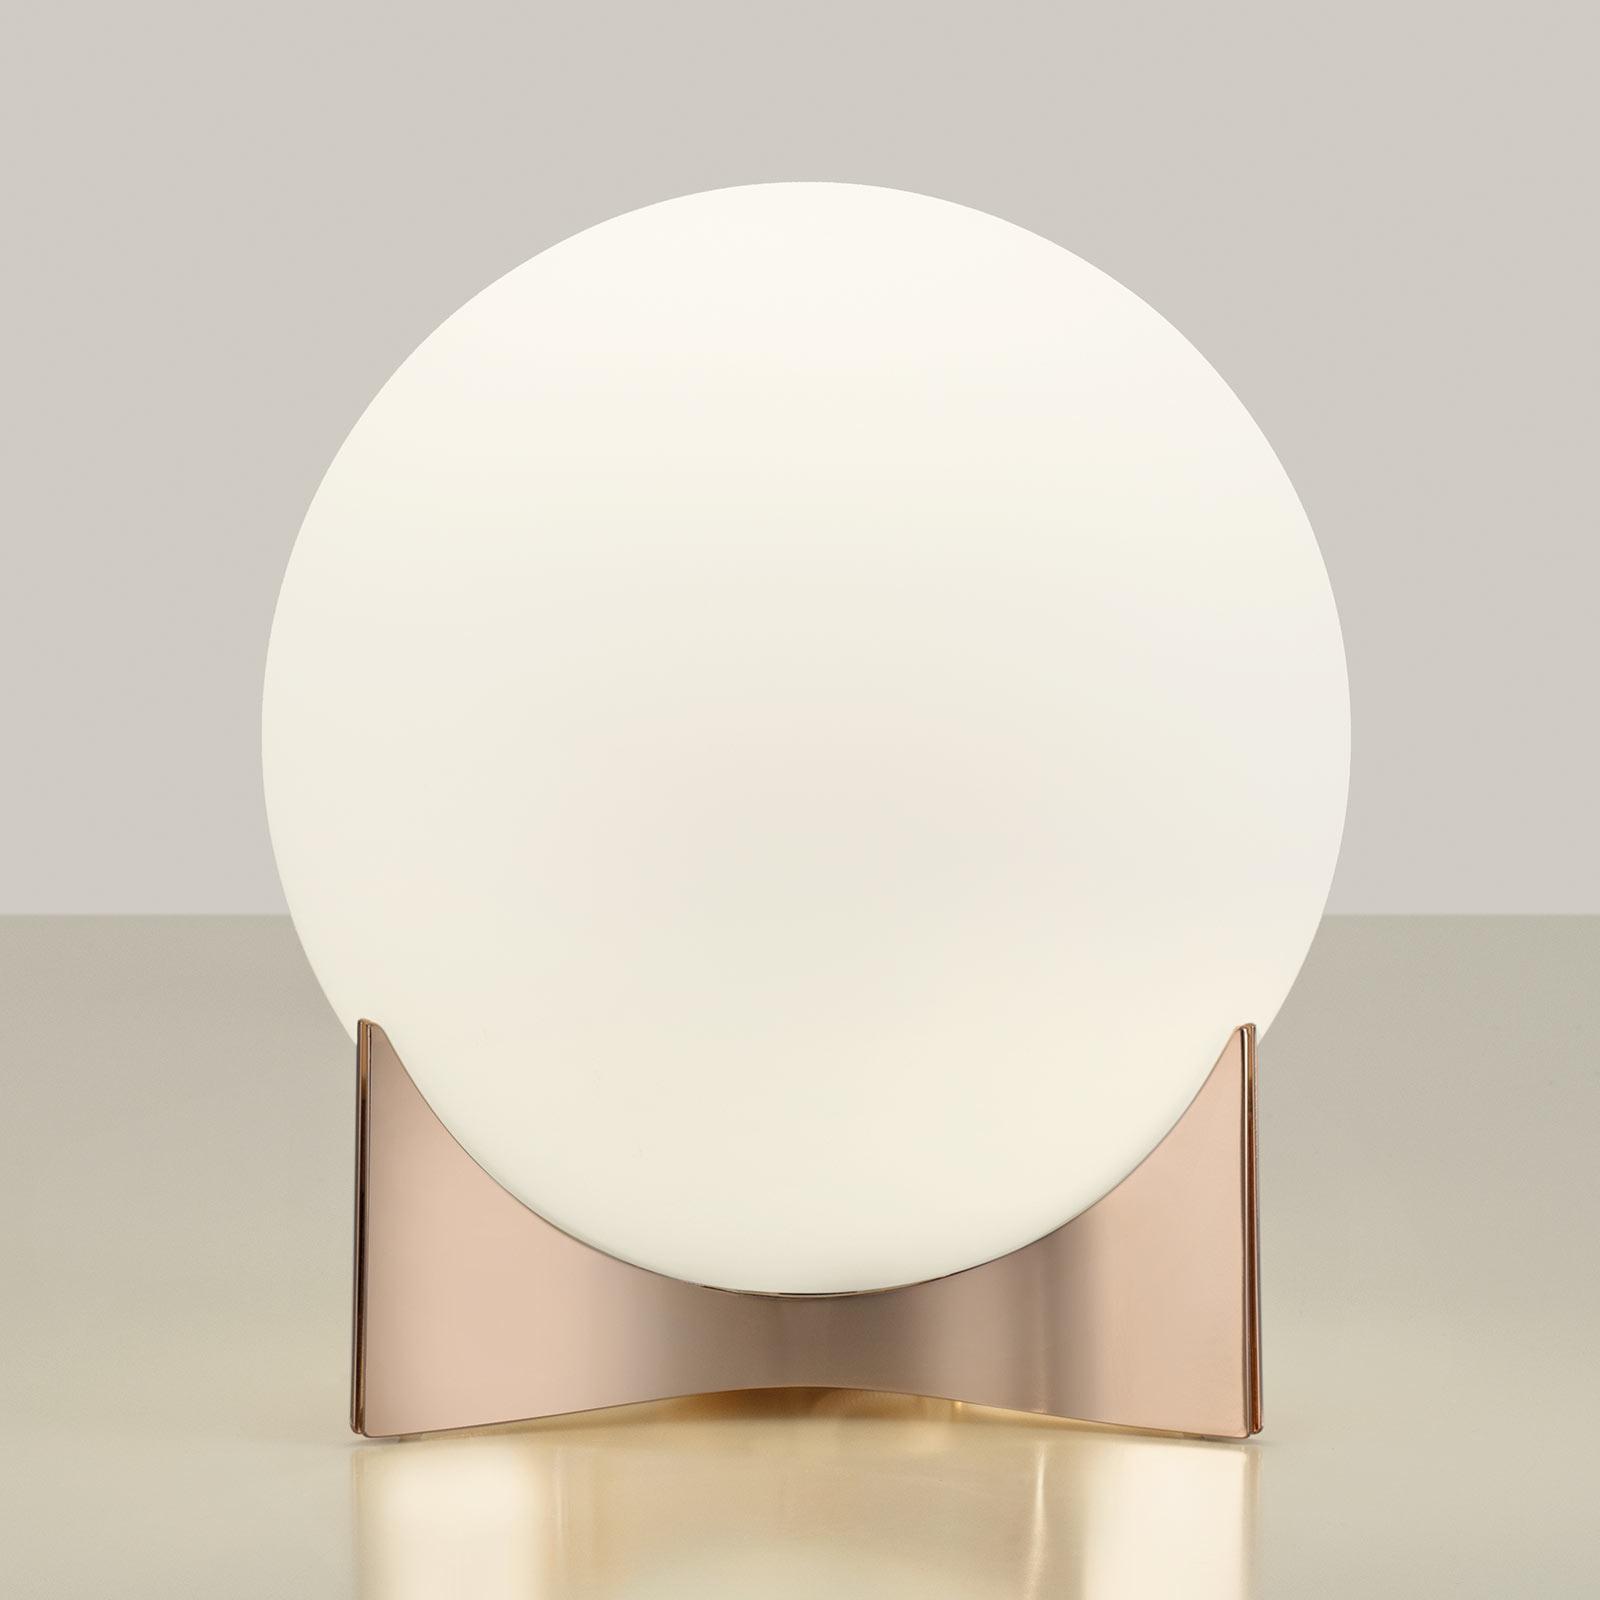 Terzani Oscar tafellamp van glas, roségoud